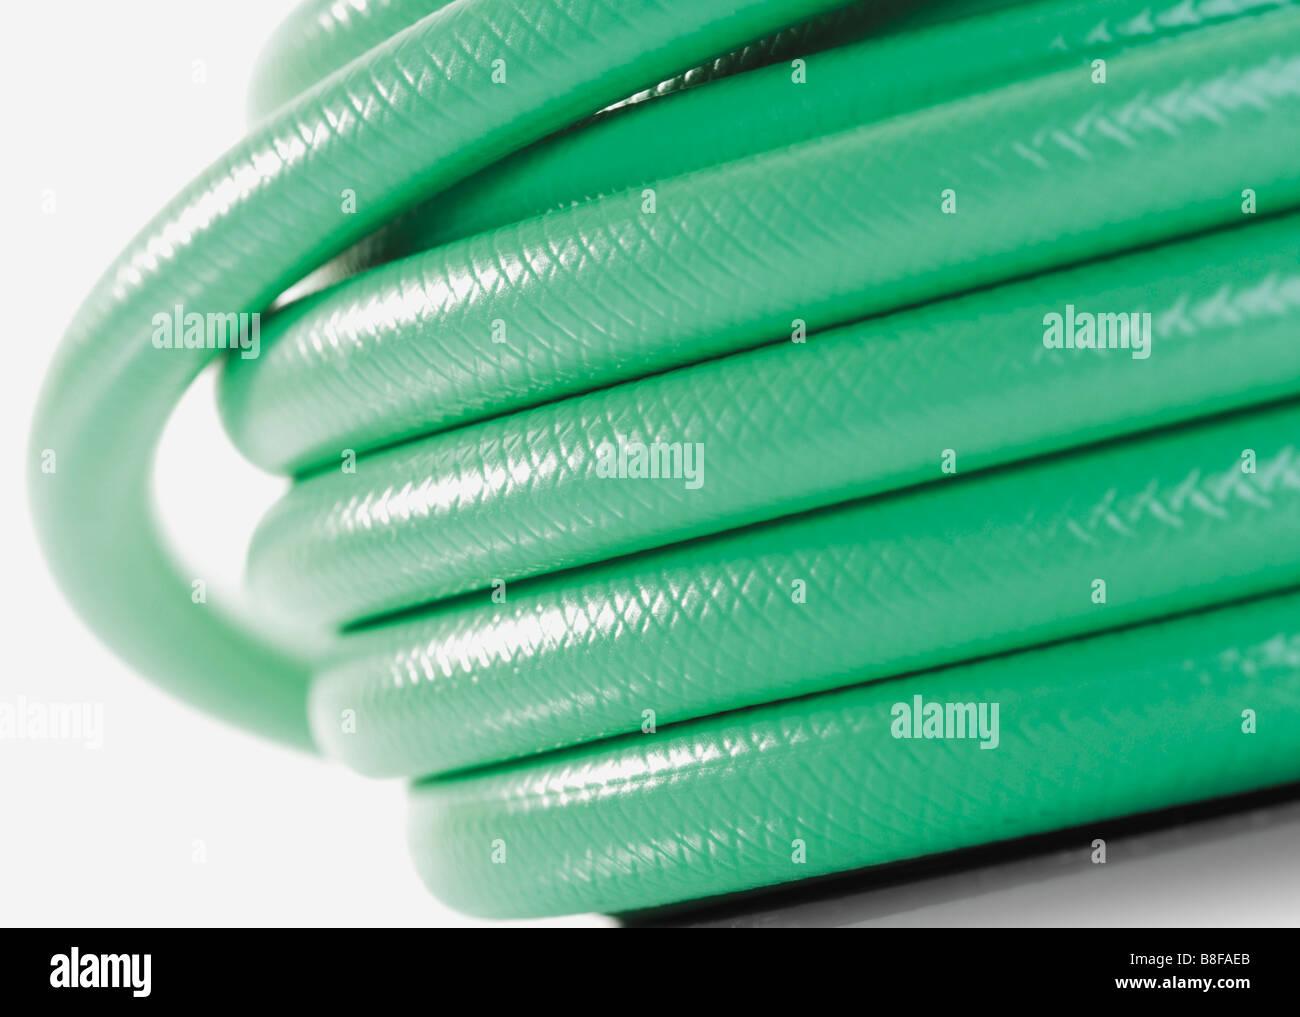 Green hosepipe - Stock Image